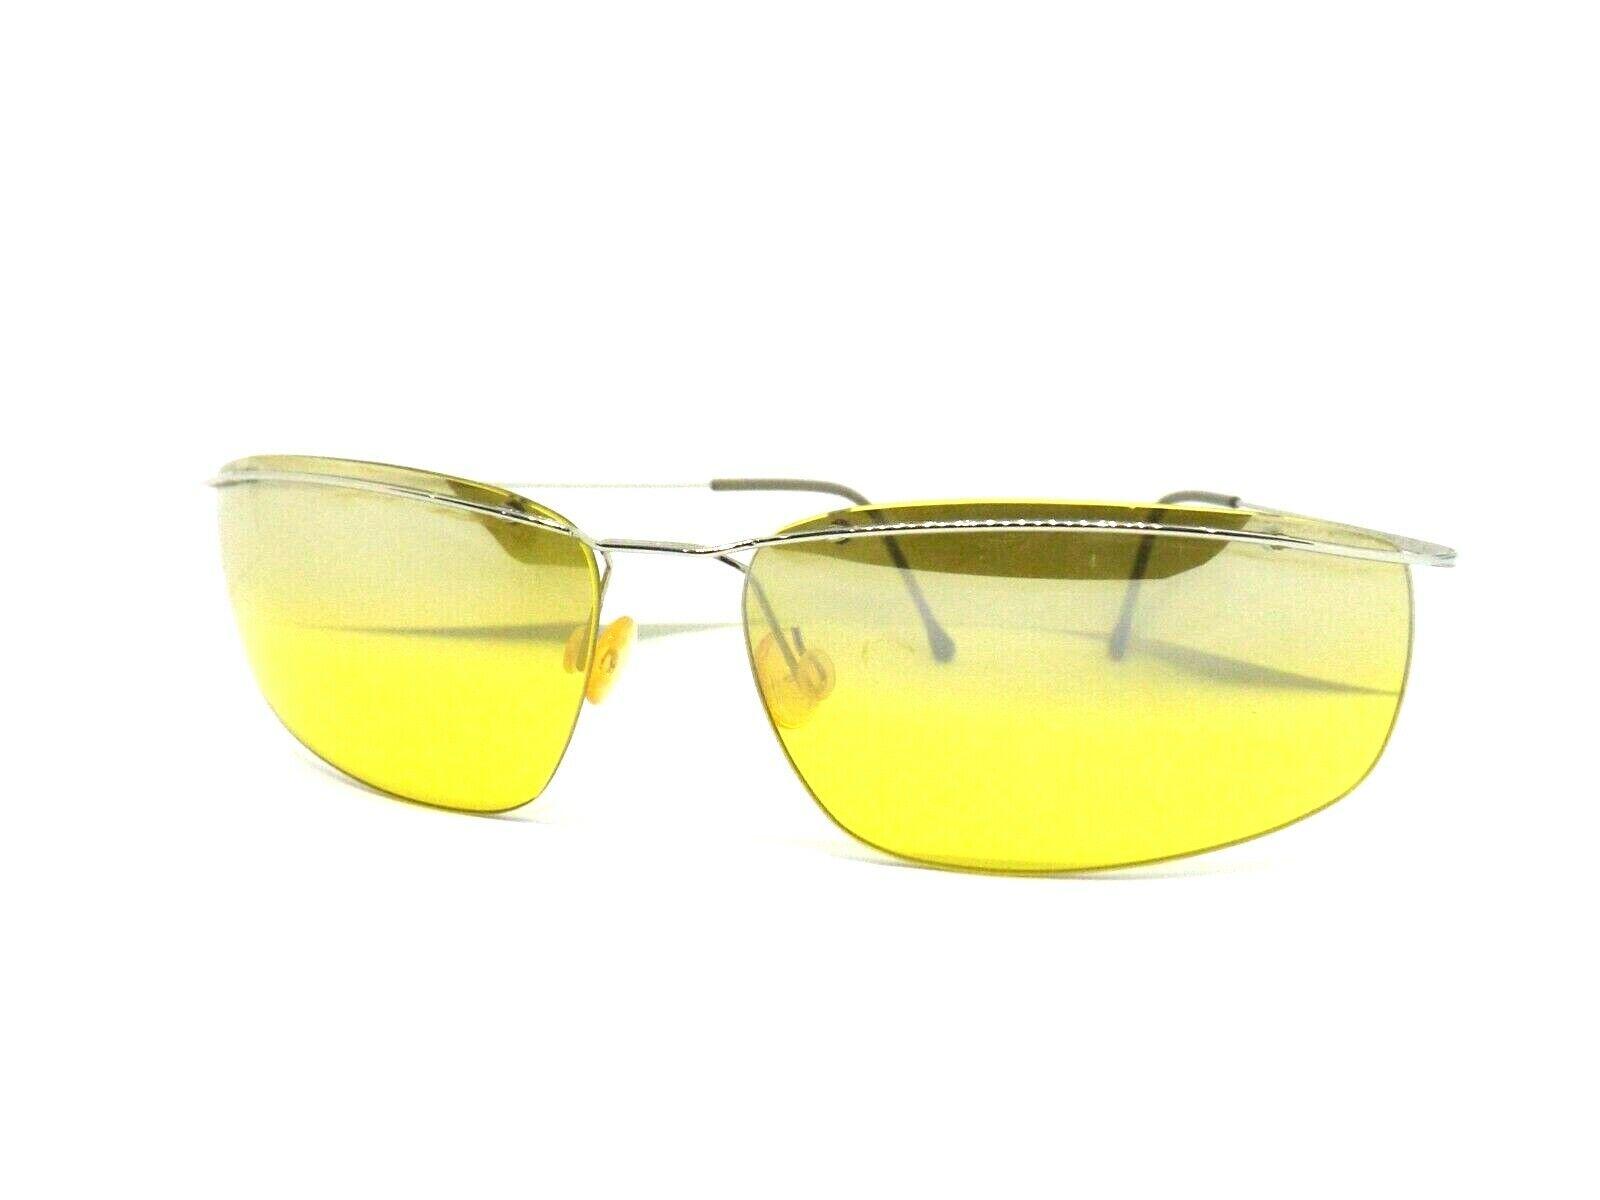 VOGUE Vo 3393-S Sunglasses Men Women Giorno Metal Lens Yellow Italy